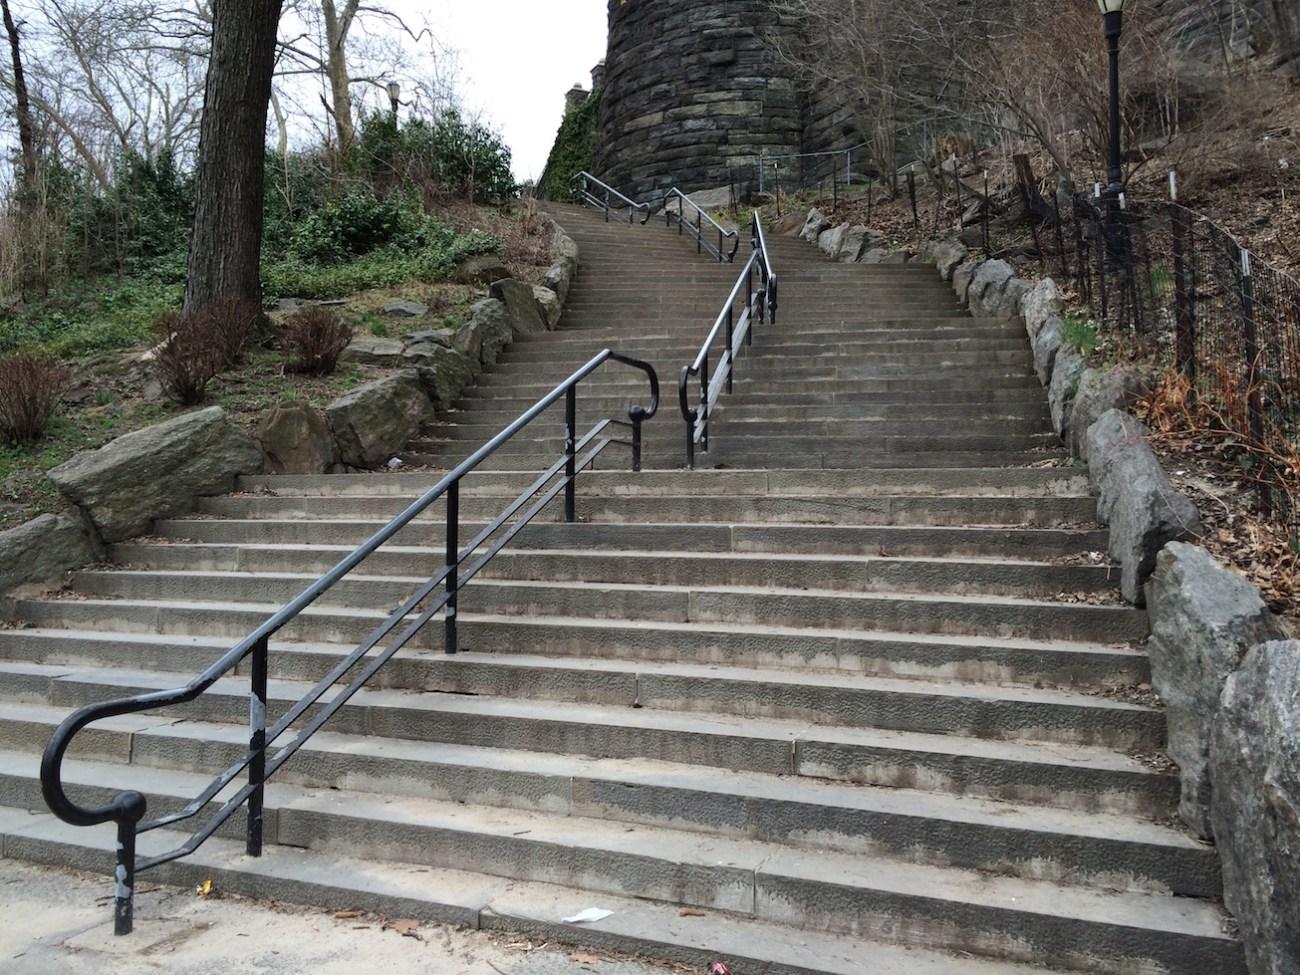 Morningside Park Stair Workout 11